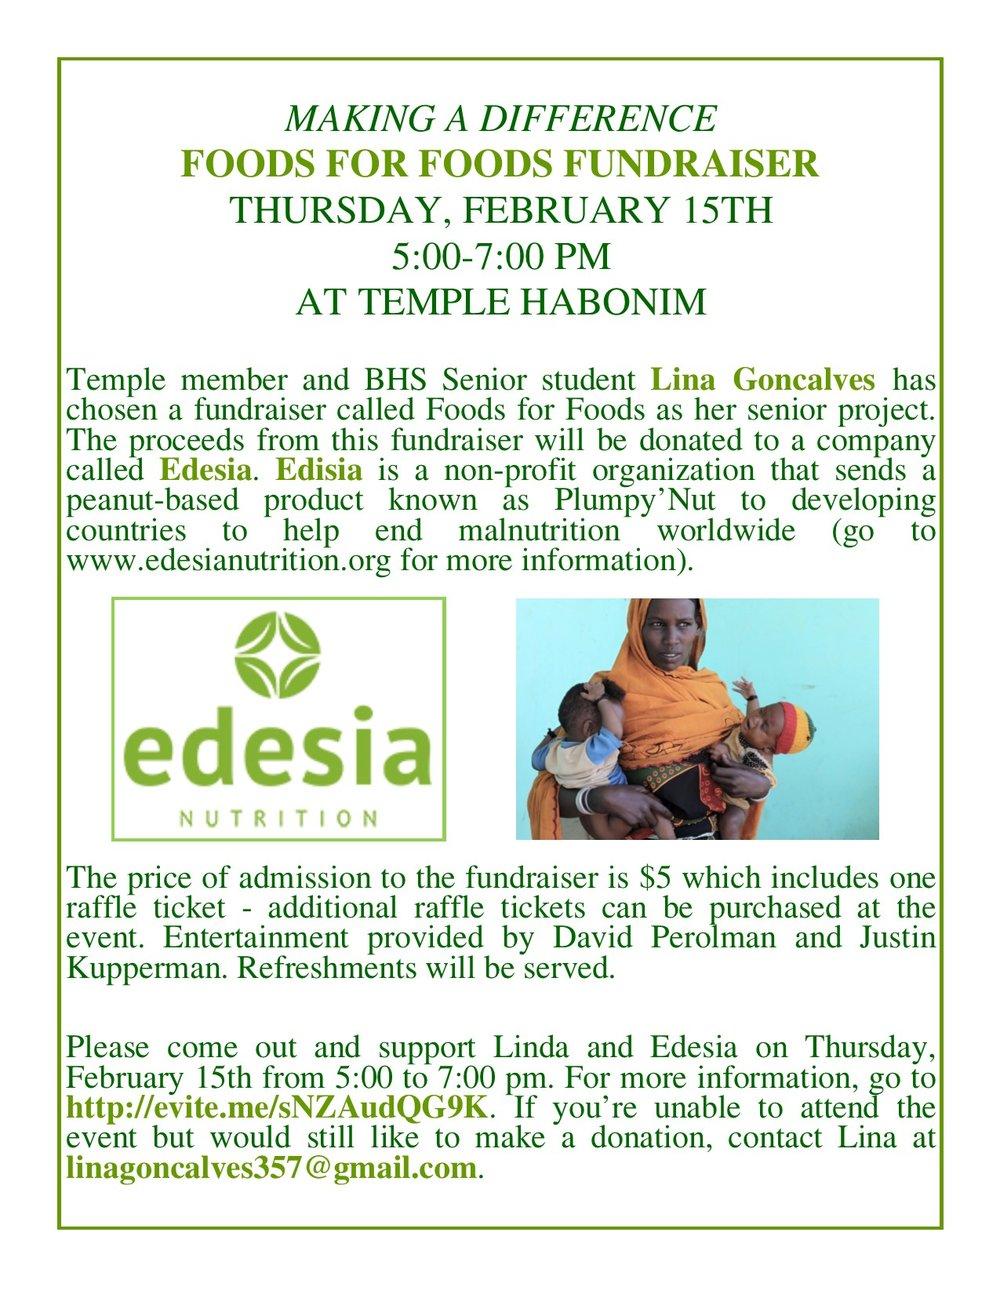 foods for foods funraiser temple habonim